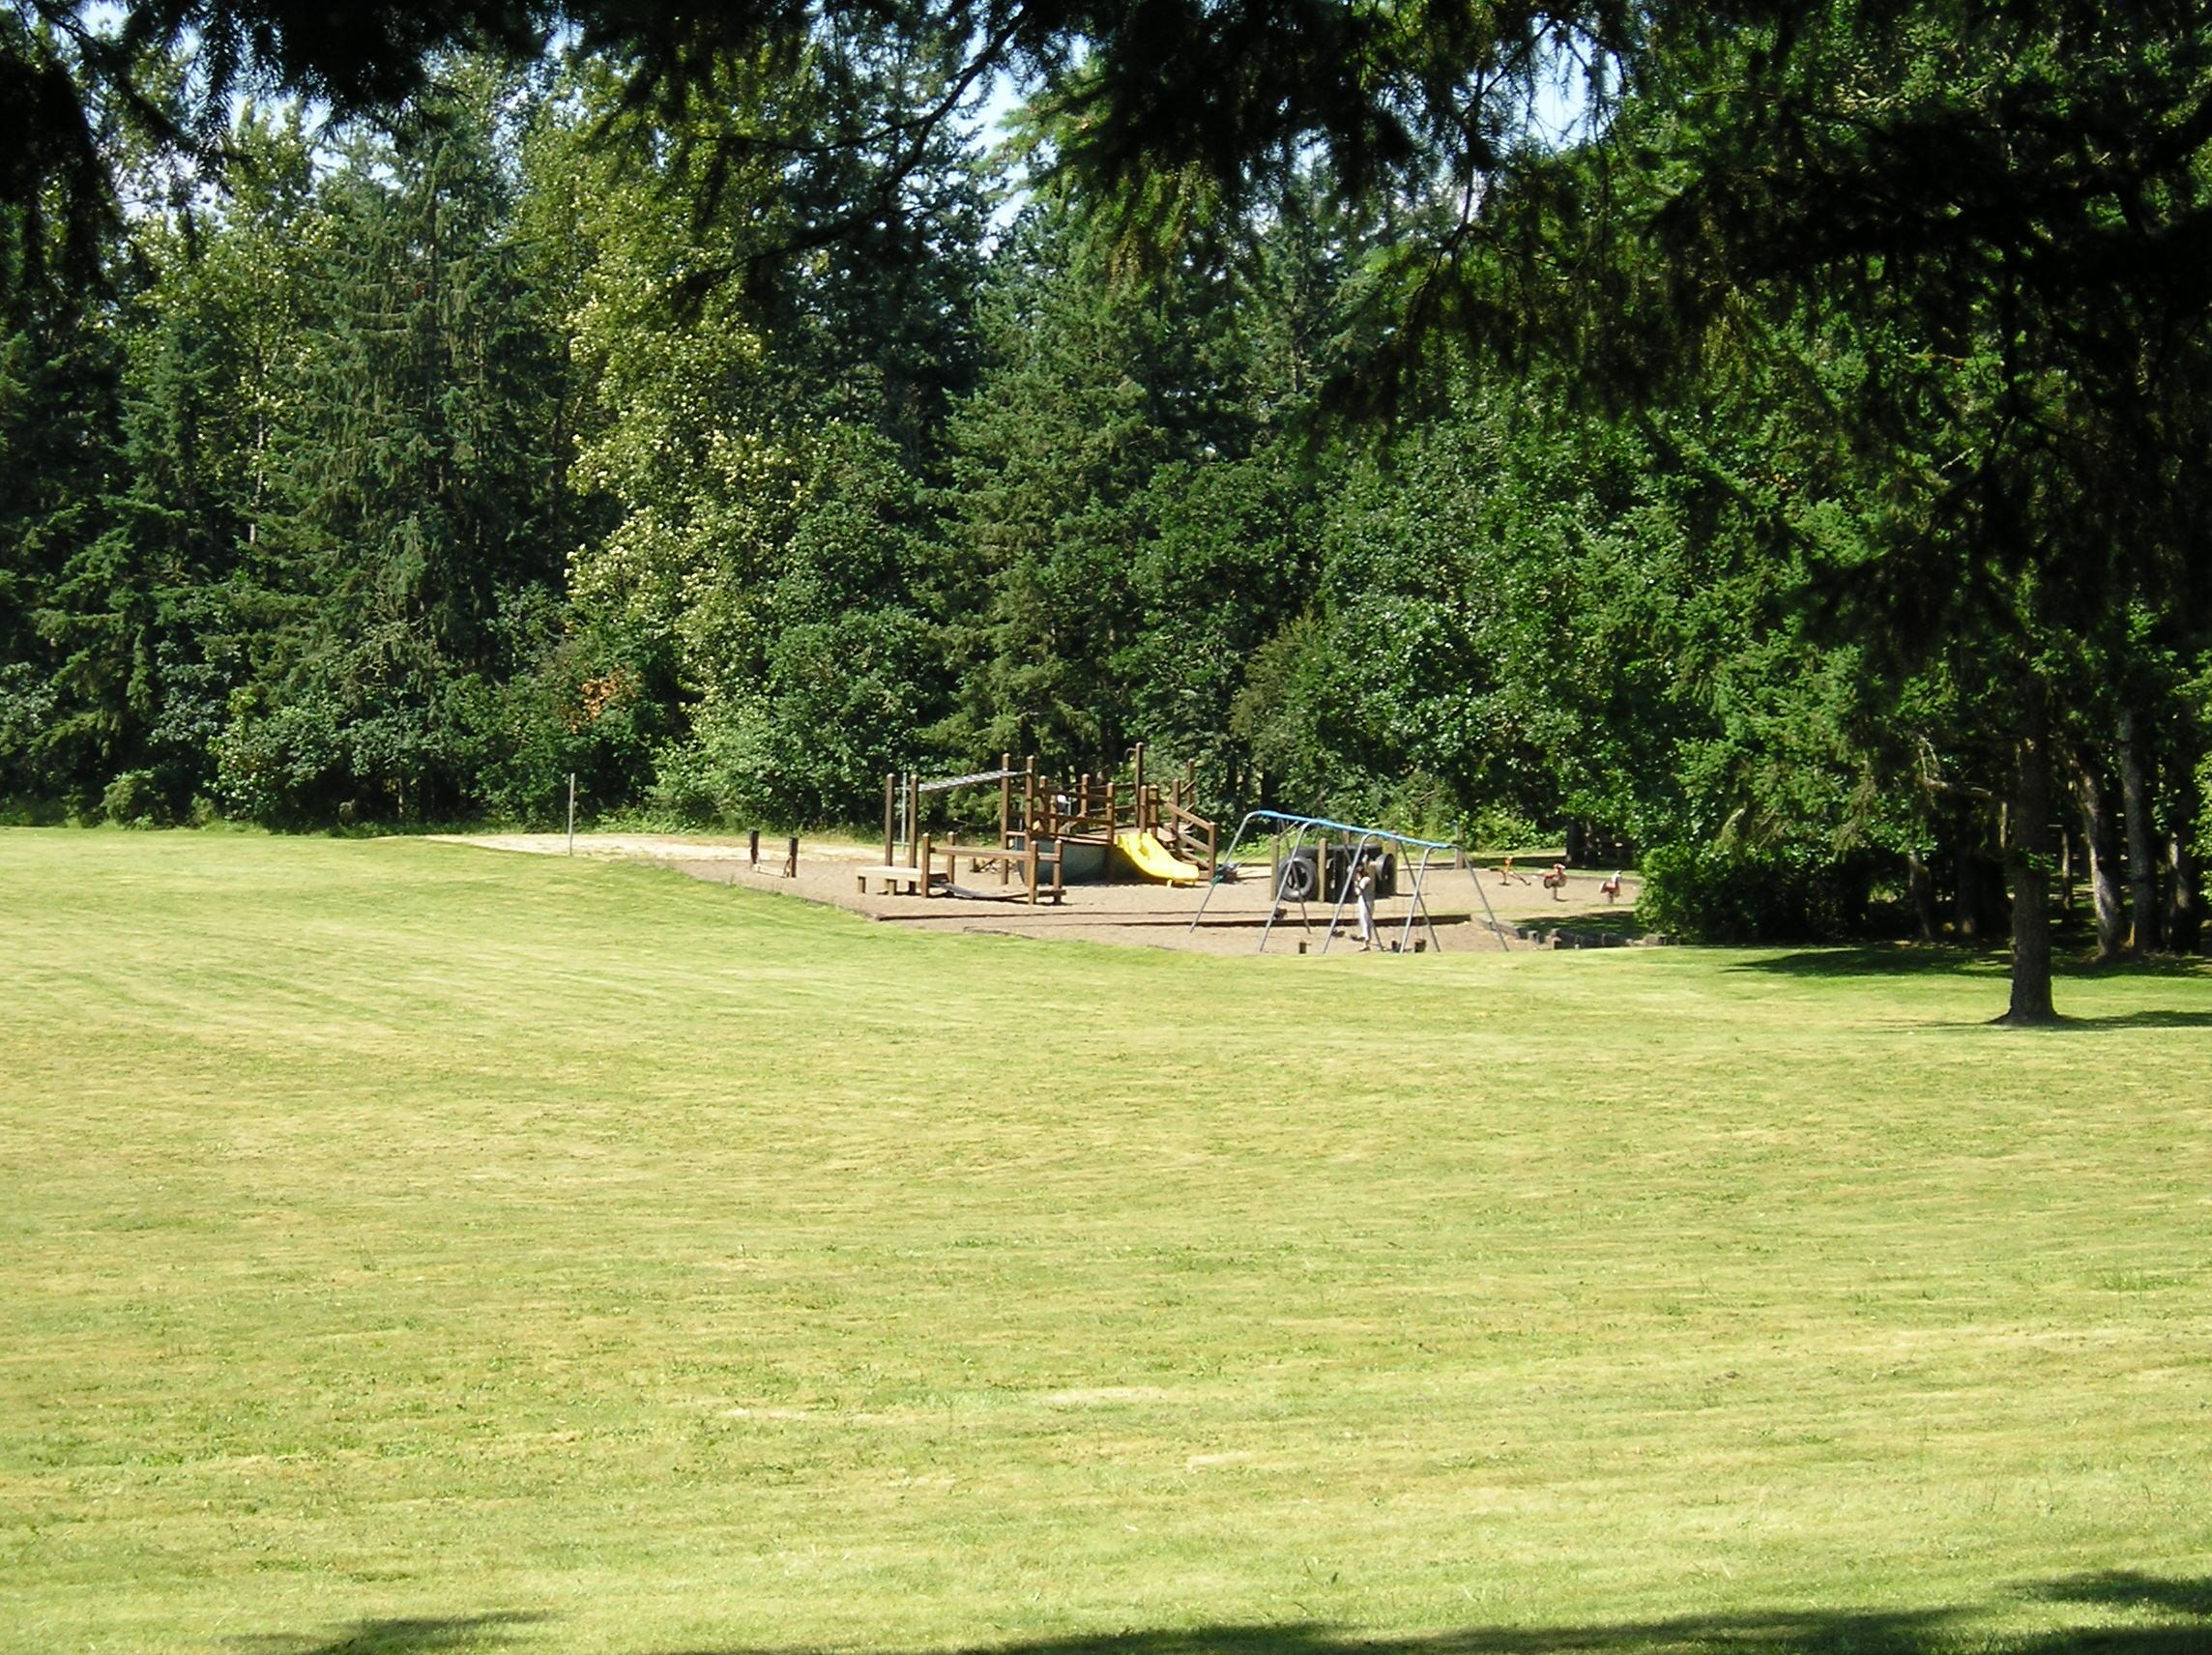 North Albany Park Benton County Oregon